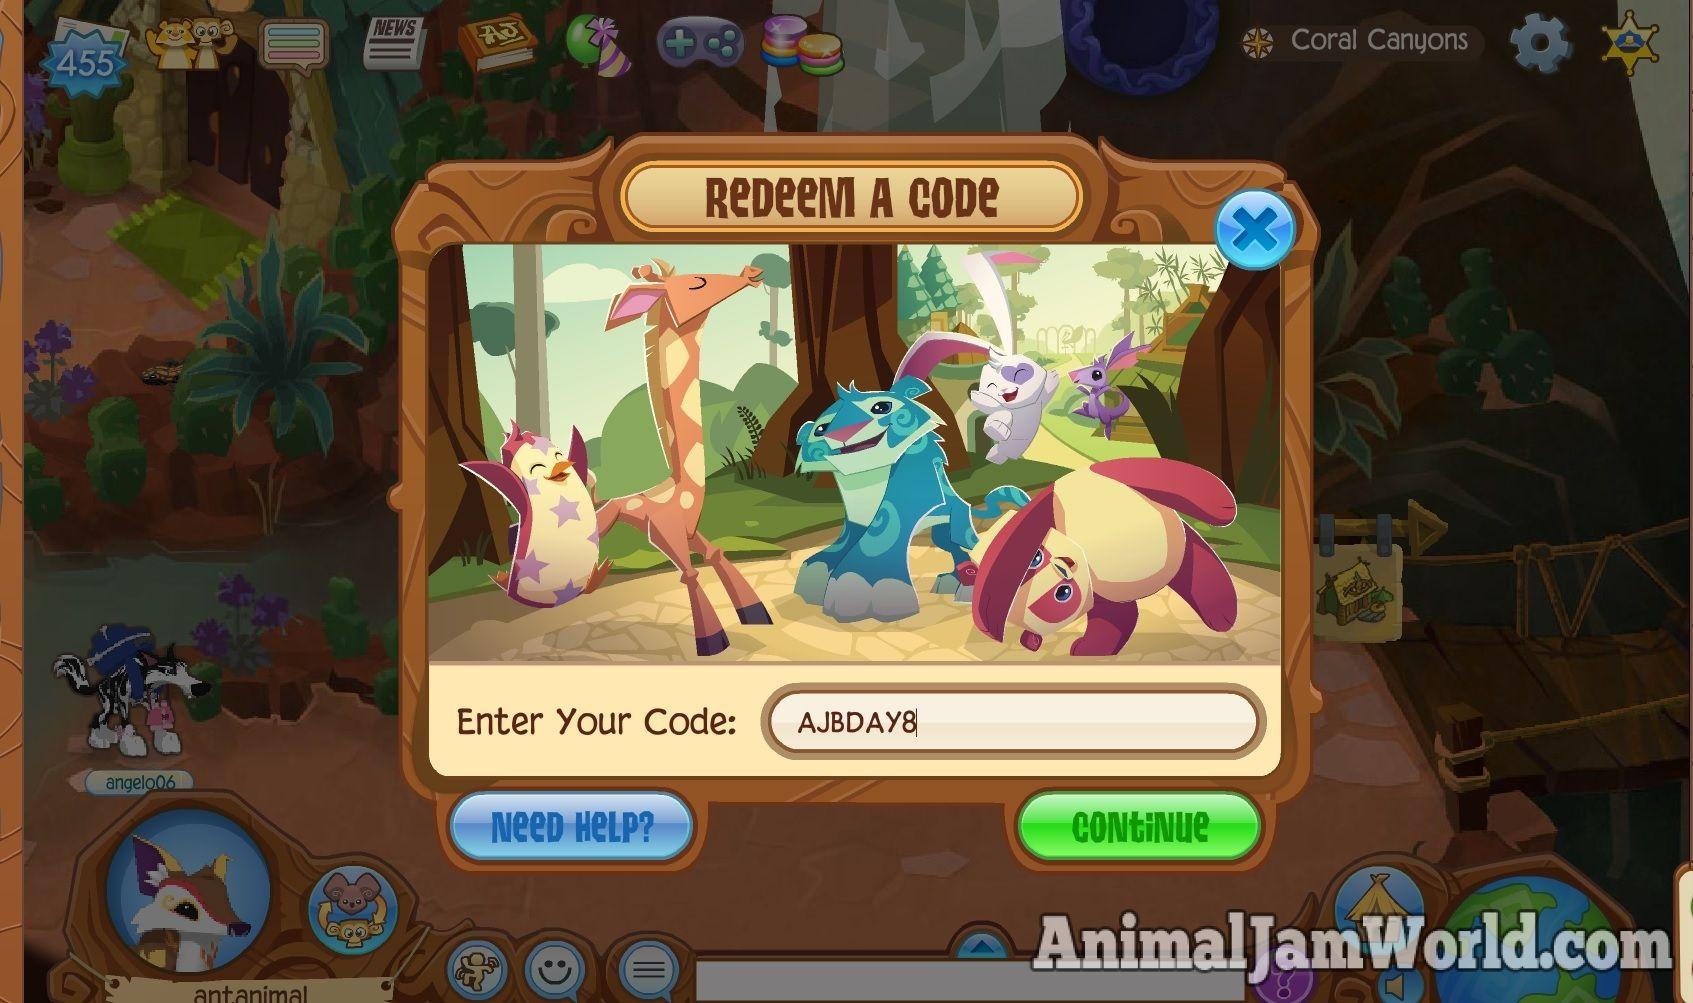 b3bdfac30b50a88ed47a80fea0fa9522 - How To Get Rare Fast On Animal Jam 2016